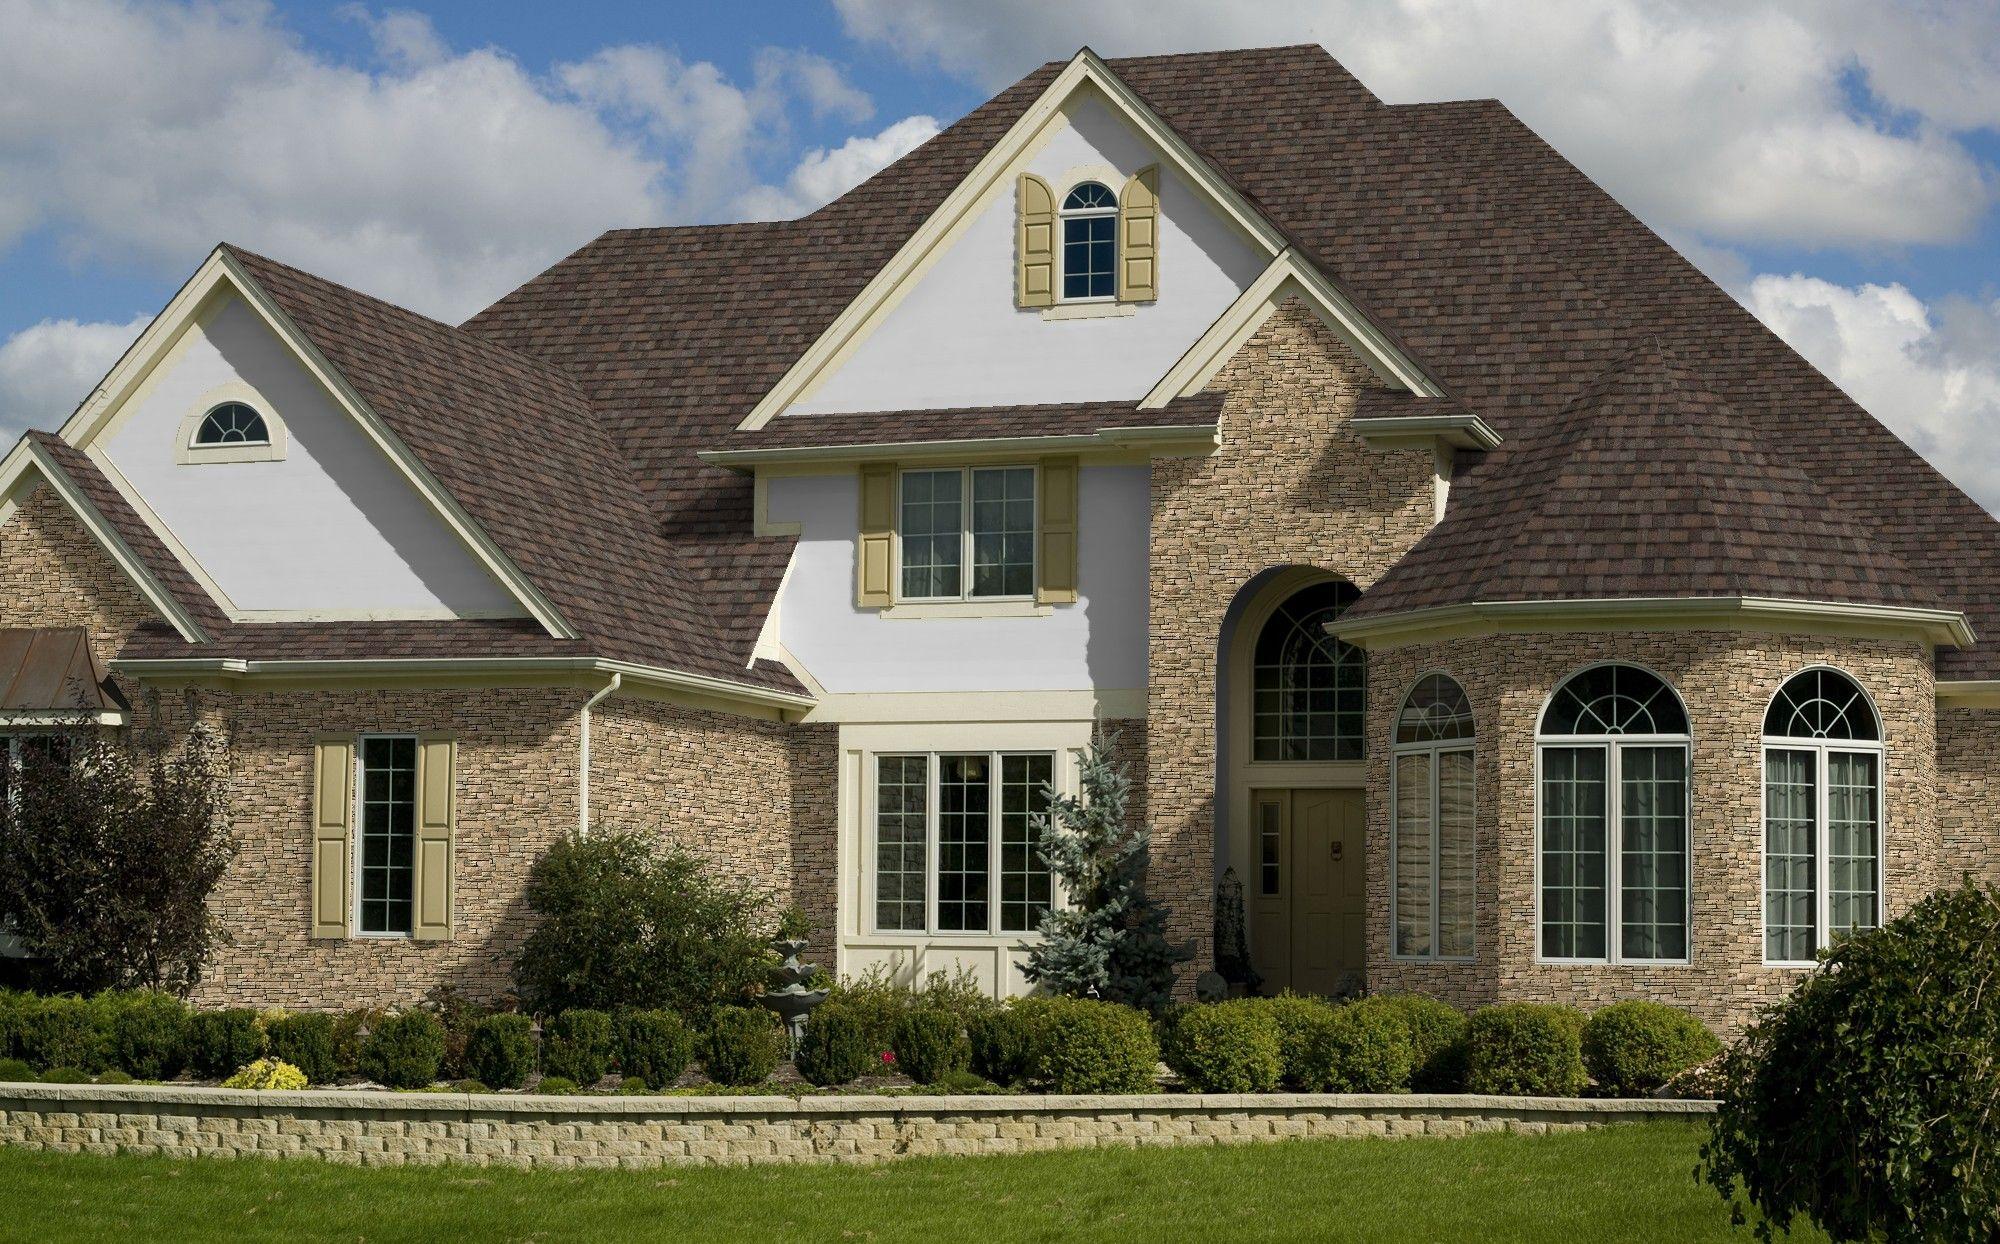 Best Flagstone Oakridge Shingles House Exterior Roof Colors 400 x 300